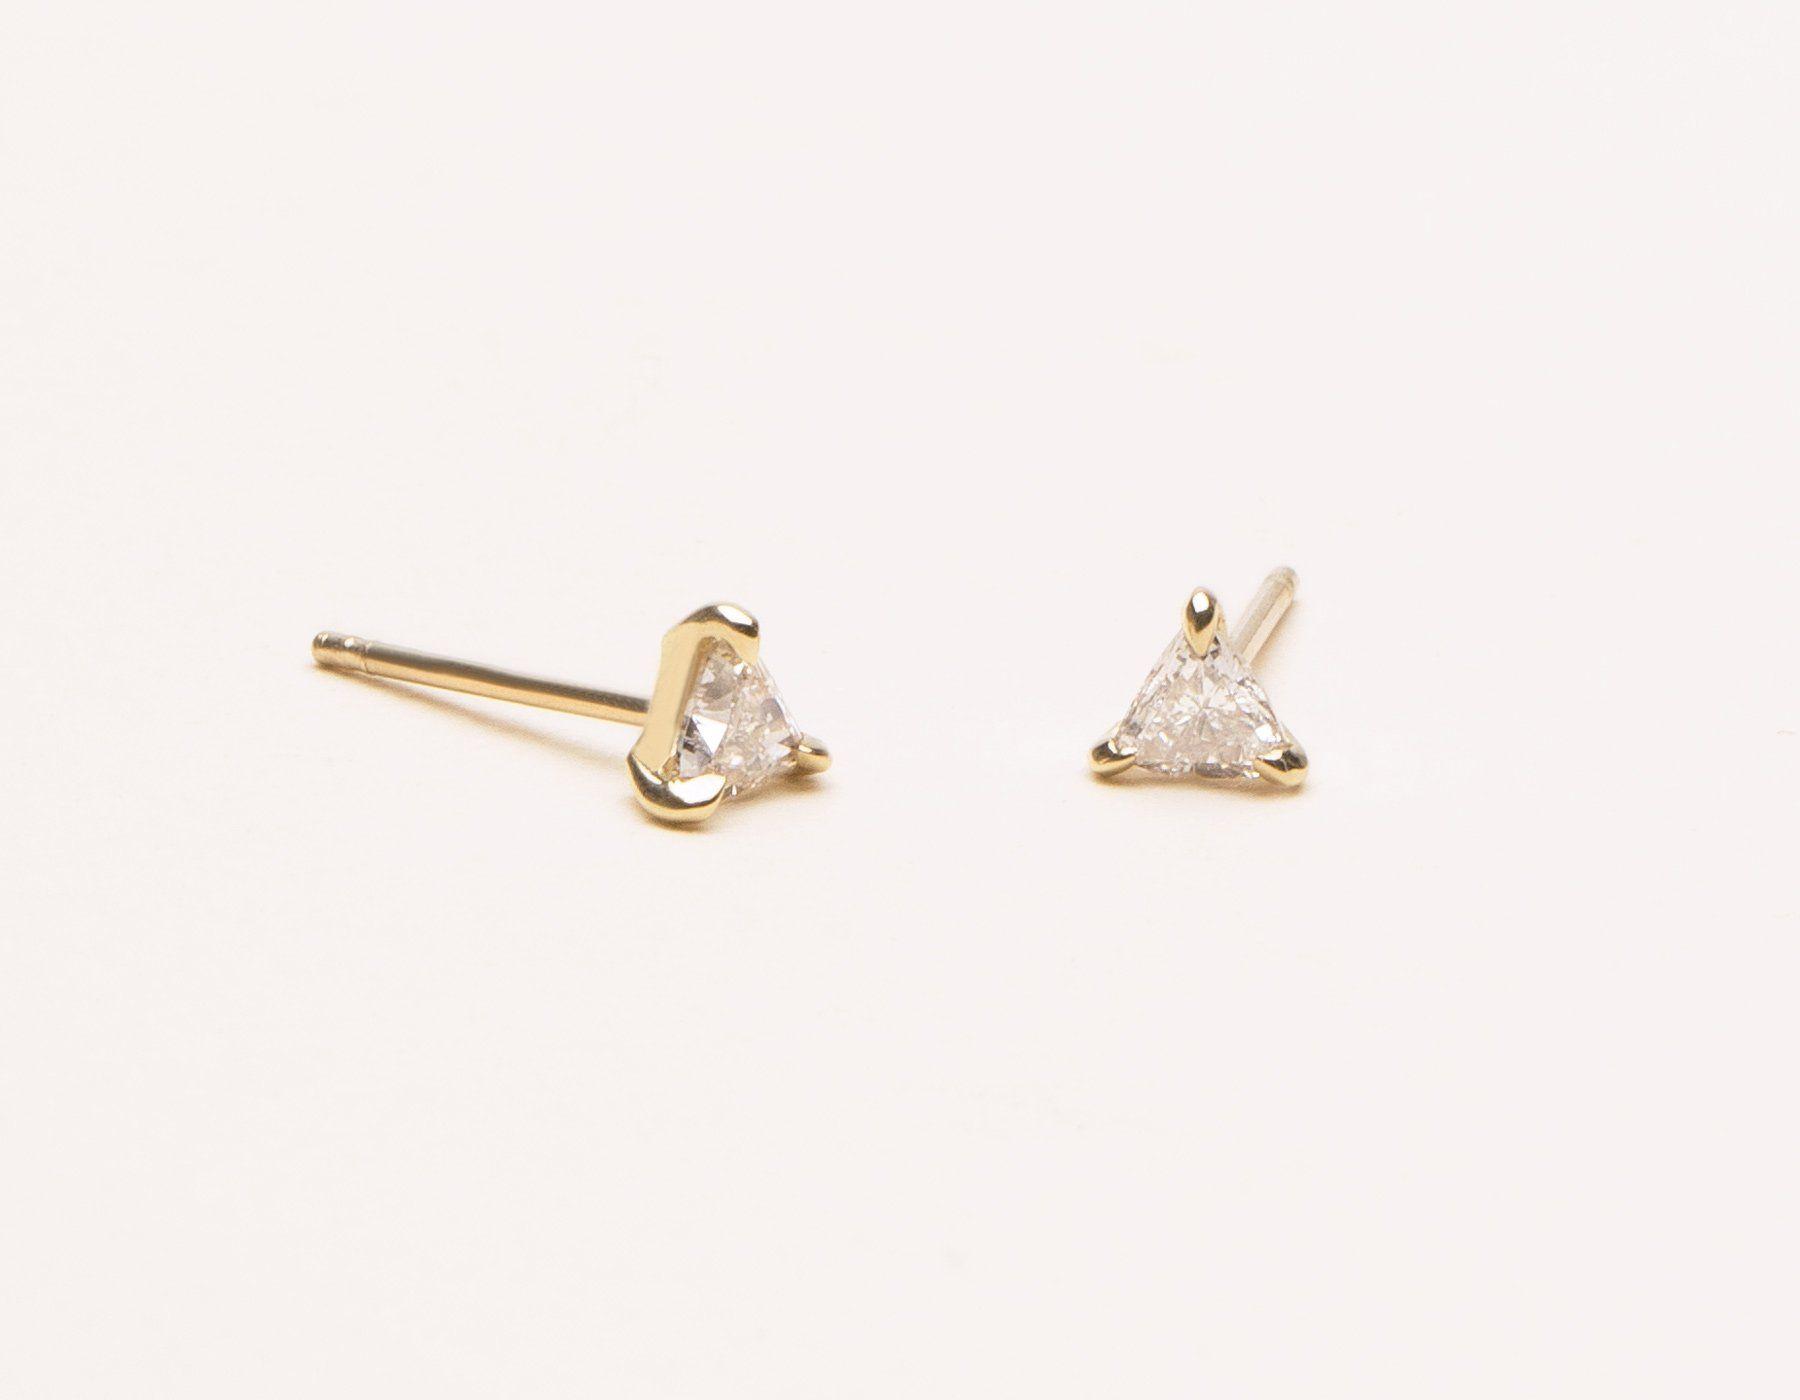 Trillion Diamond Earrings Wish List Pinterest